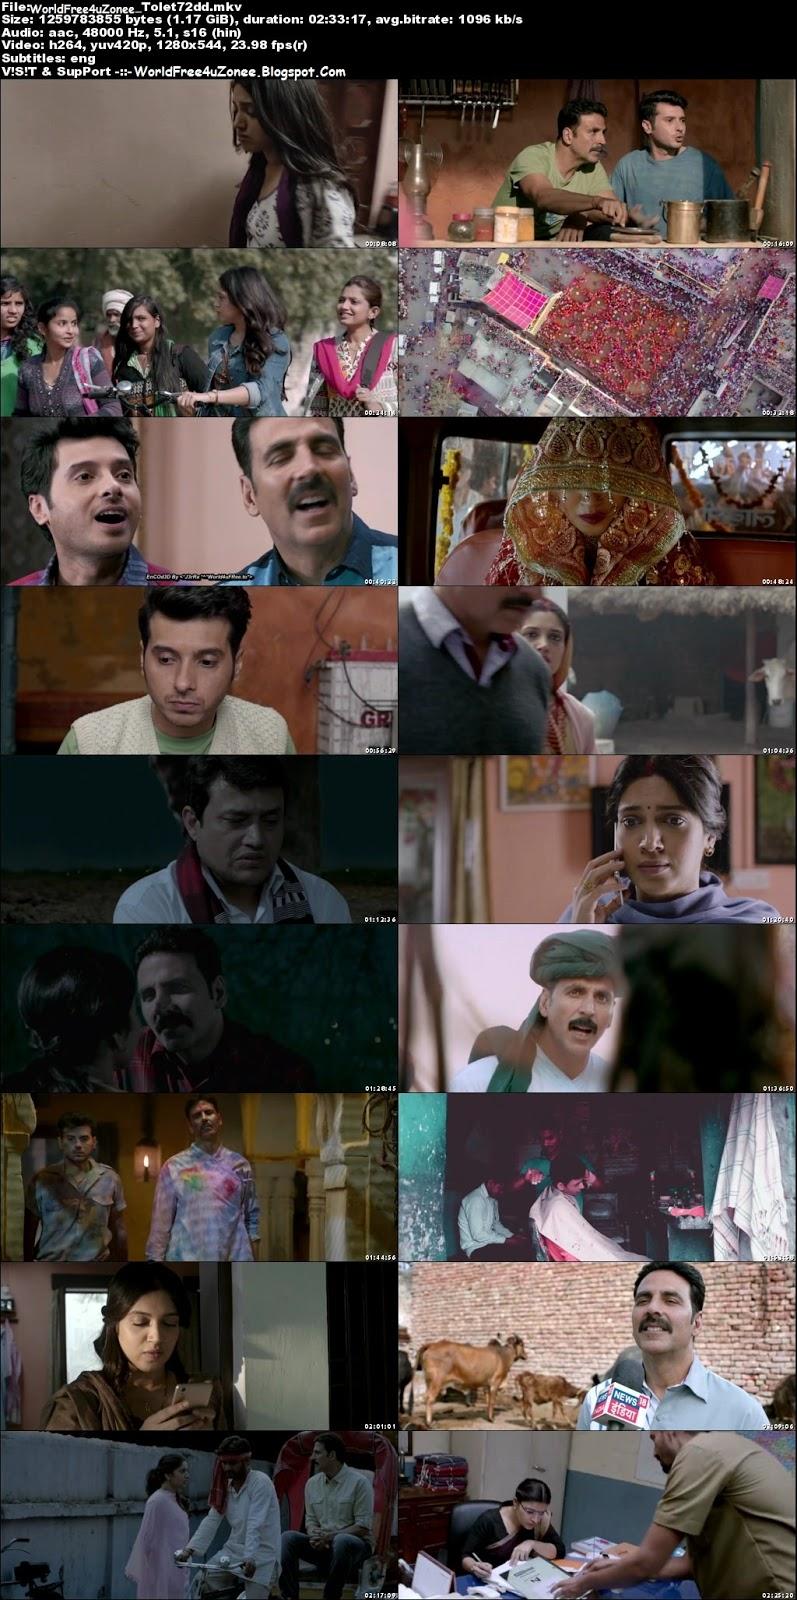 Toilet Ek Prem Katha (2017) Hindi DVDRip 720p 1.2GB Full Movie Free Download And Watch Online Latest Bollywood Hindi Movies 2017 Free At WorldFree4uZonee.Blogspot.Com